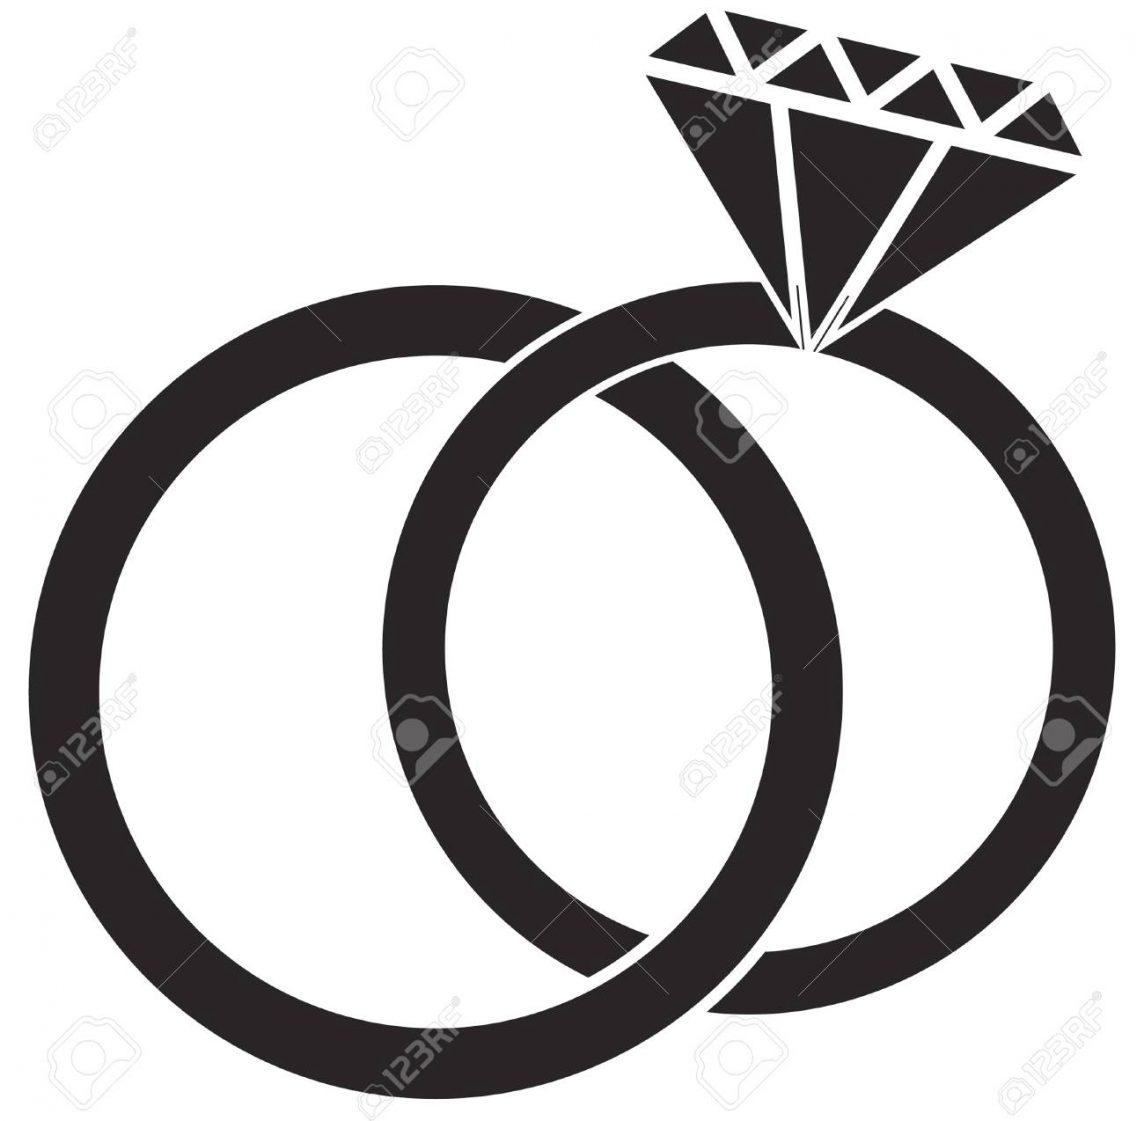 1144x1121 Wedding Ring Silhouette